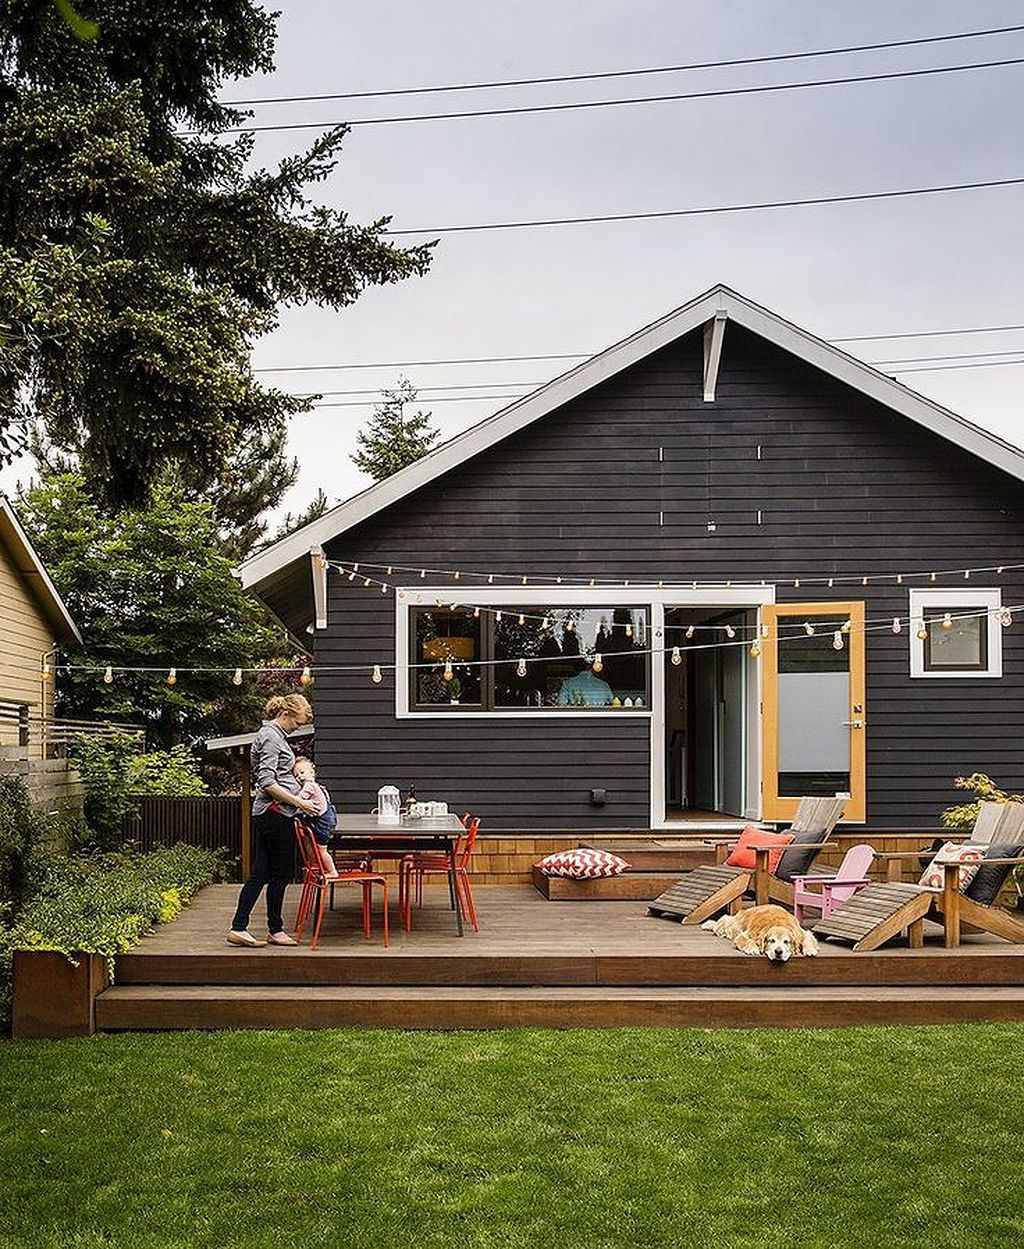 Backyard Ideas On A Budget 2